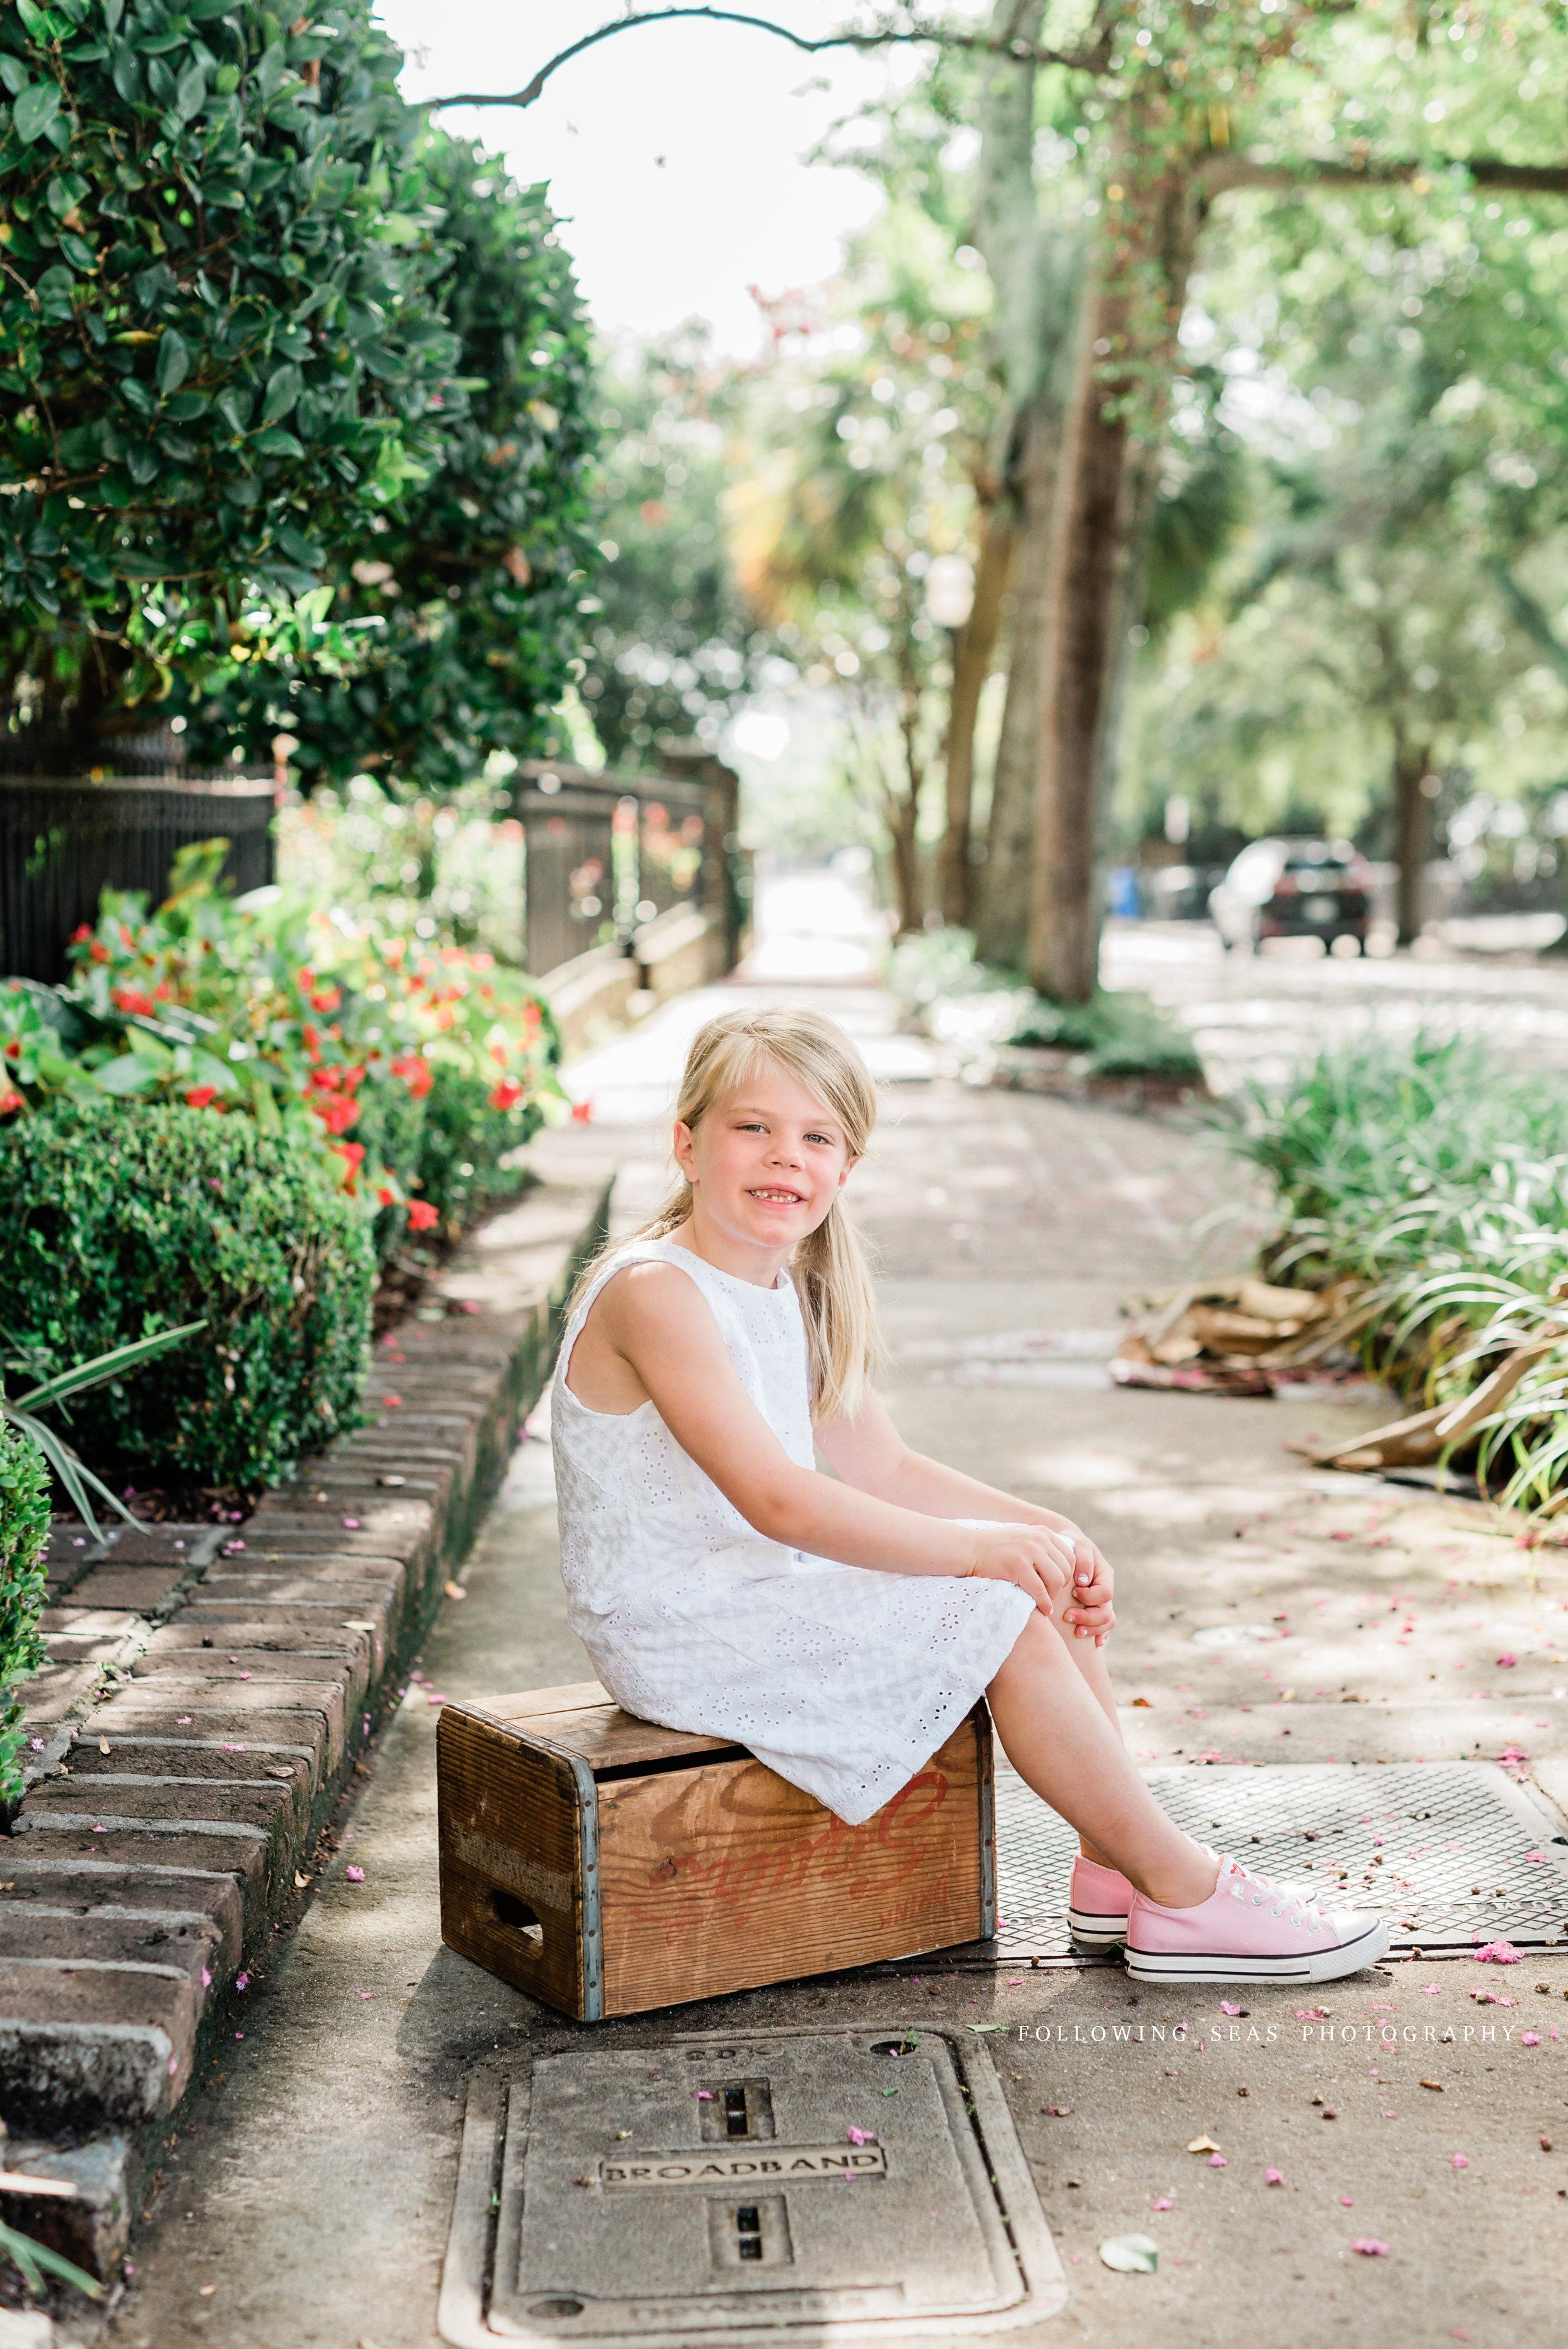 Charleston-Family-Photographer-Following-Seas-Photography-5332.jpg